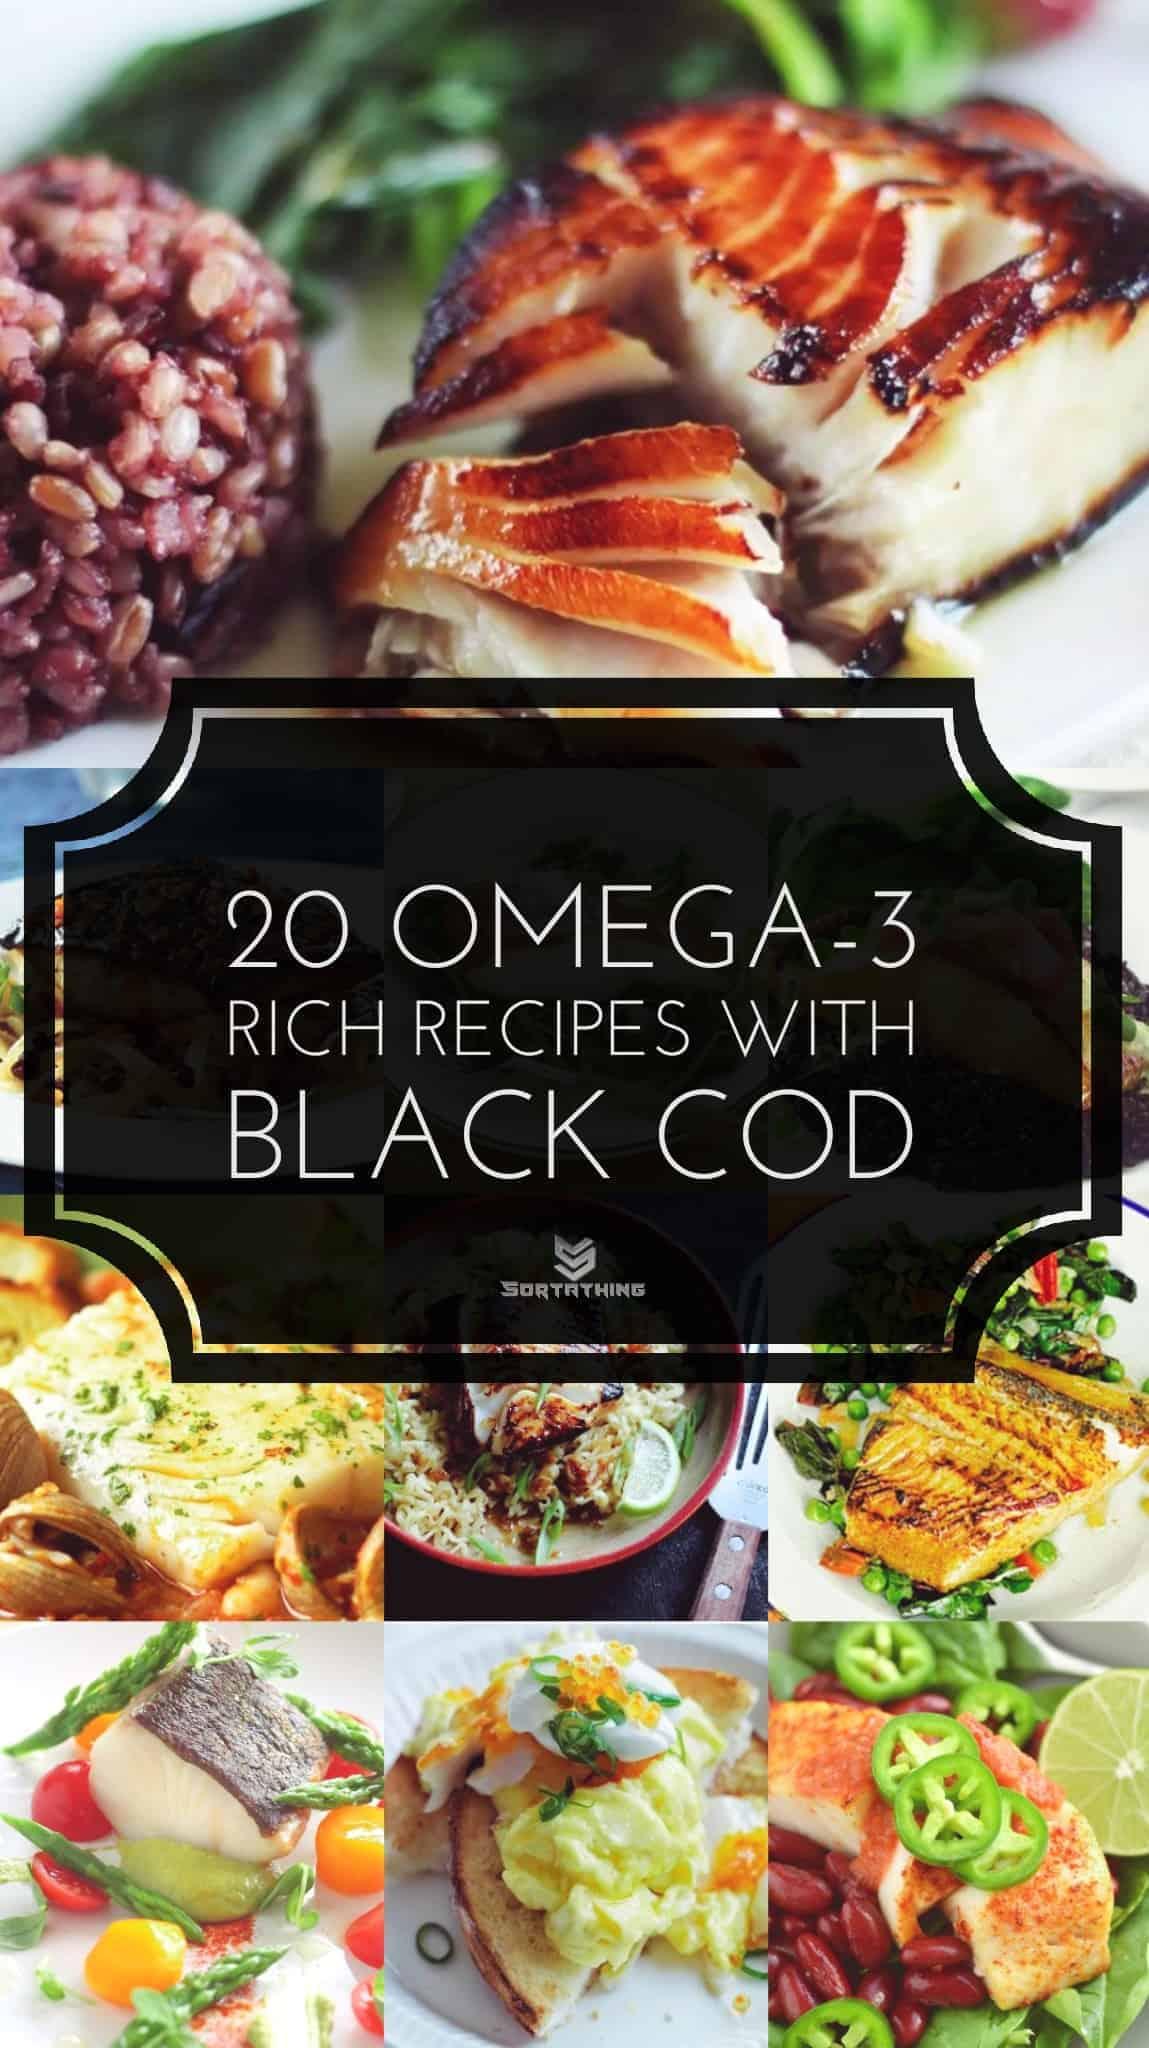 20 Omega-3 Rich Black Cod Fish Recipes